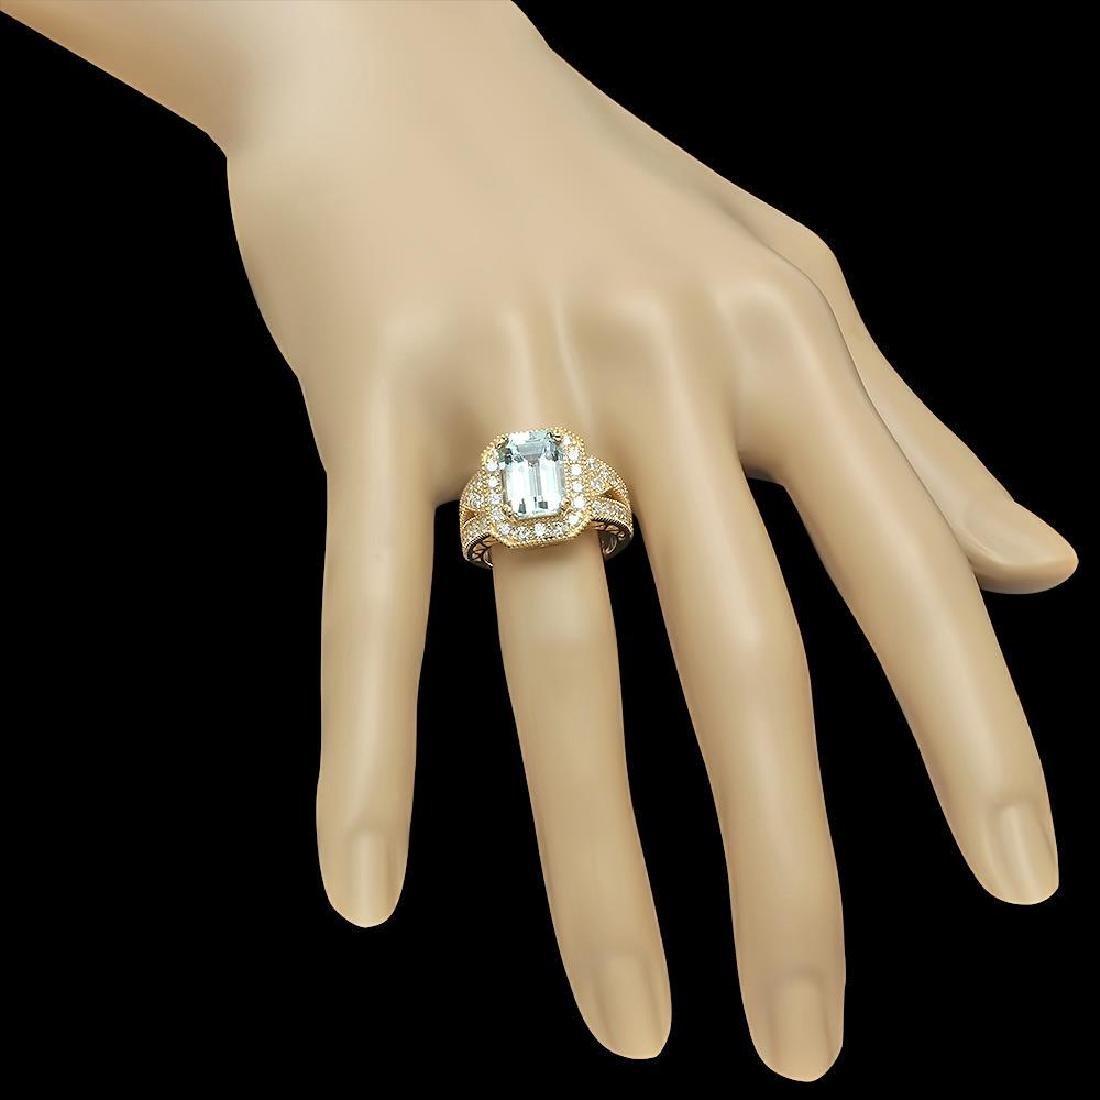 14K Gold 3.85ct Aquamarine & 1.46ct Diamond Ring - 3